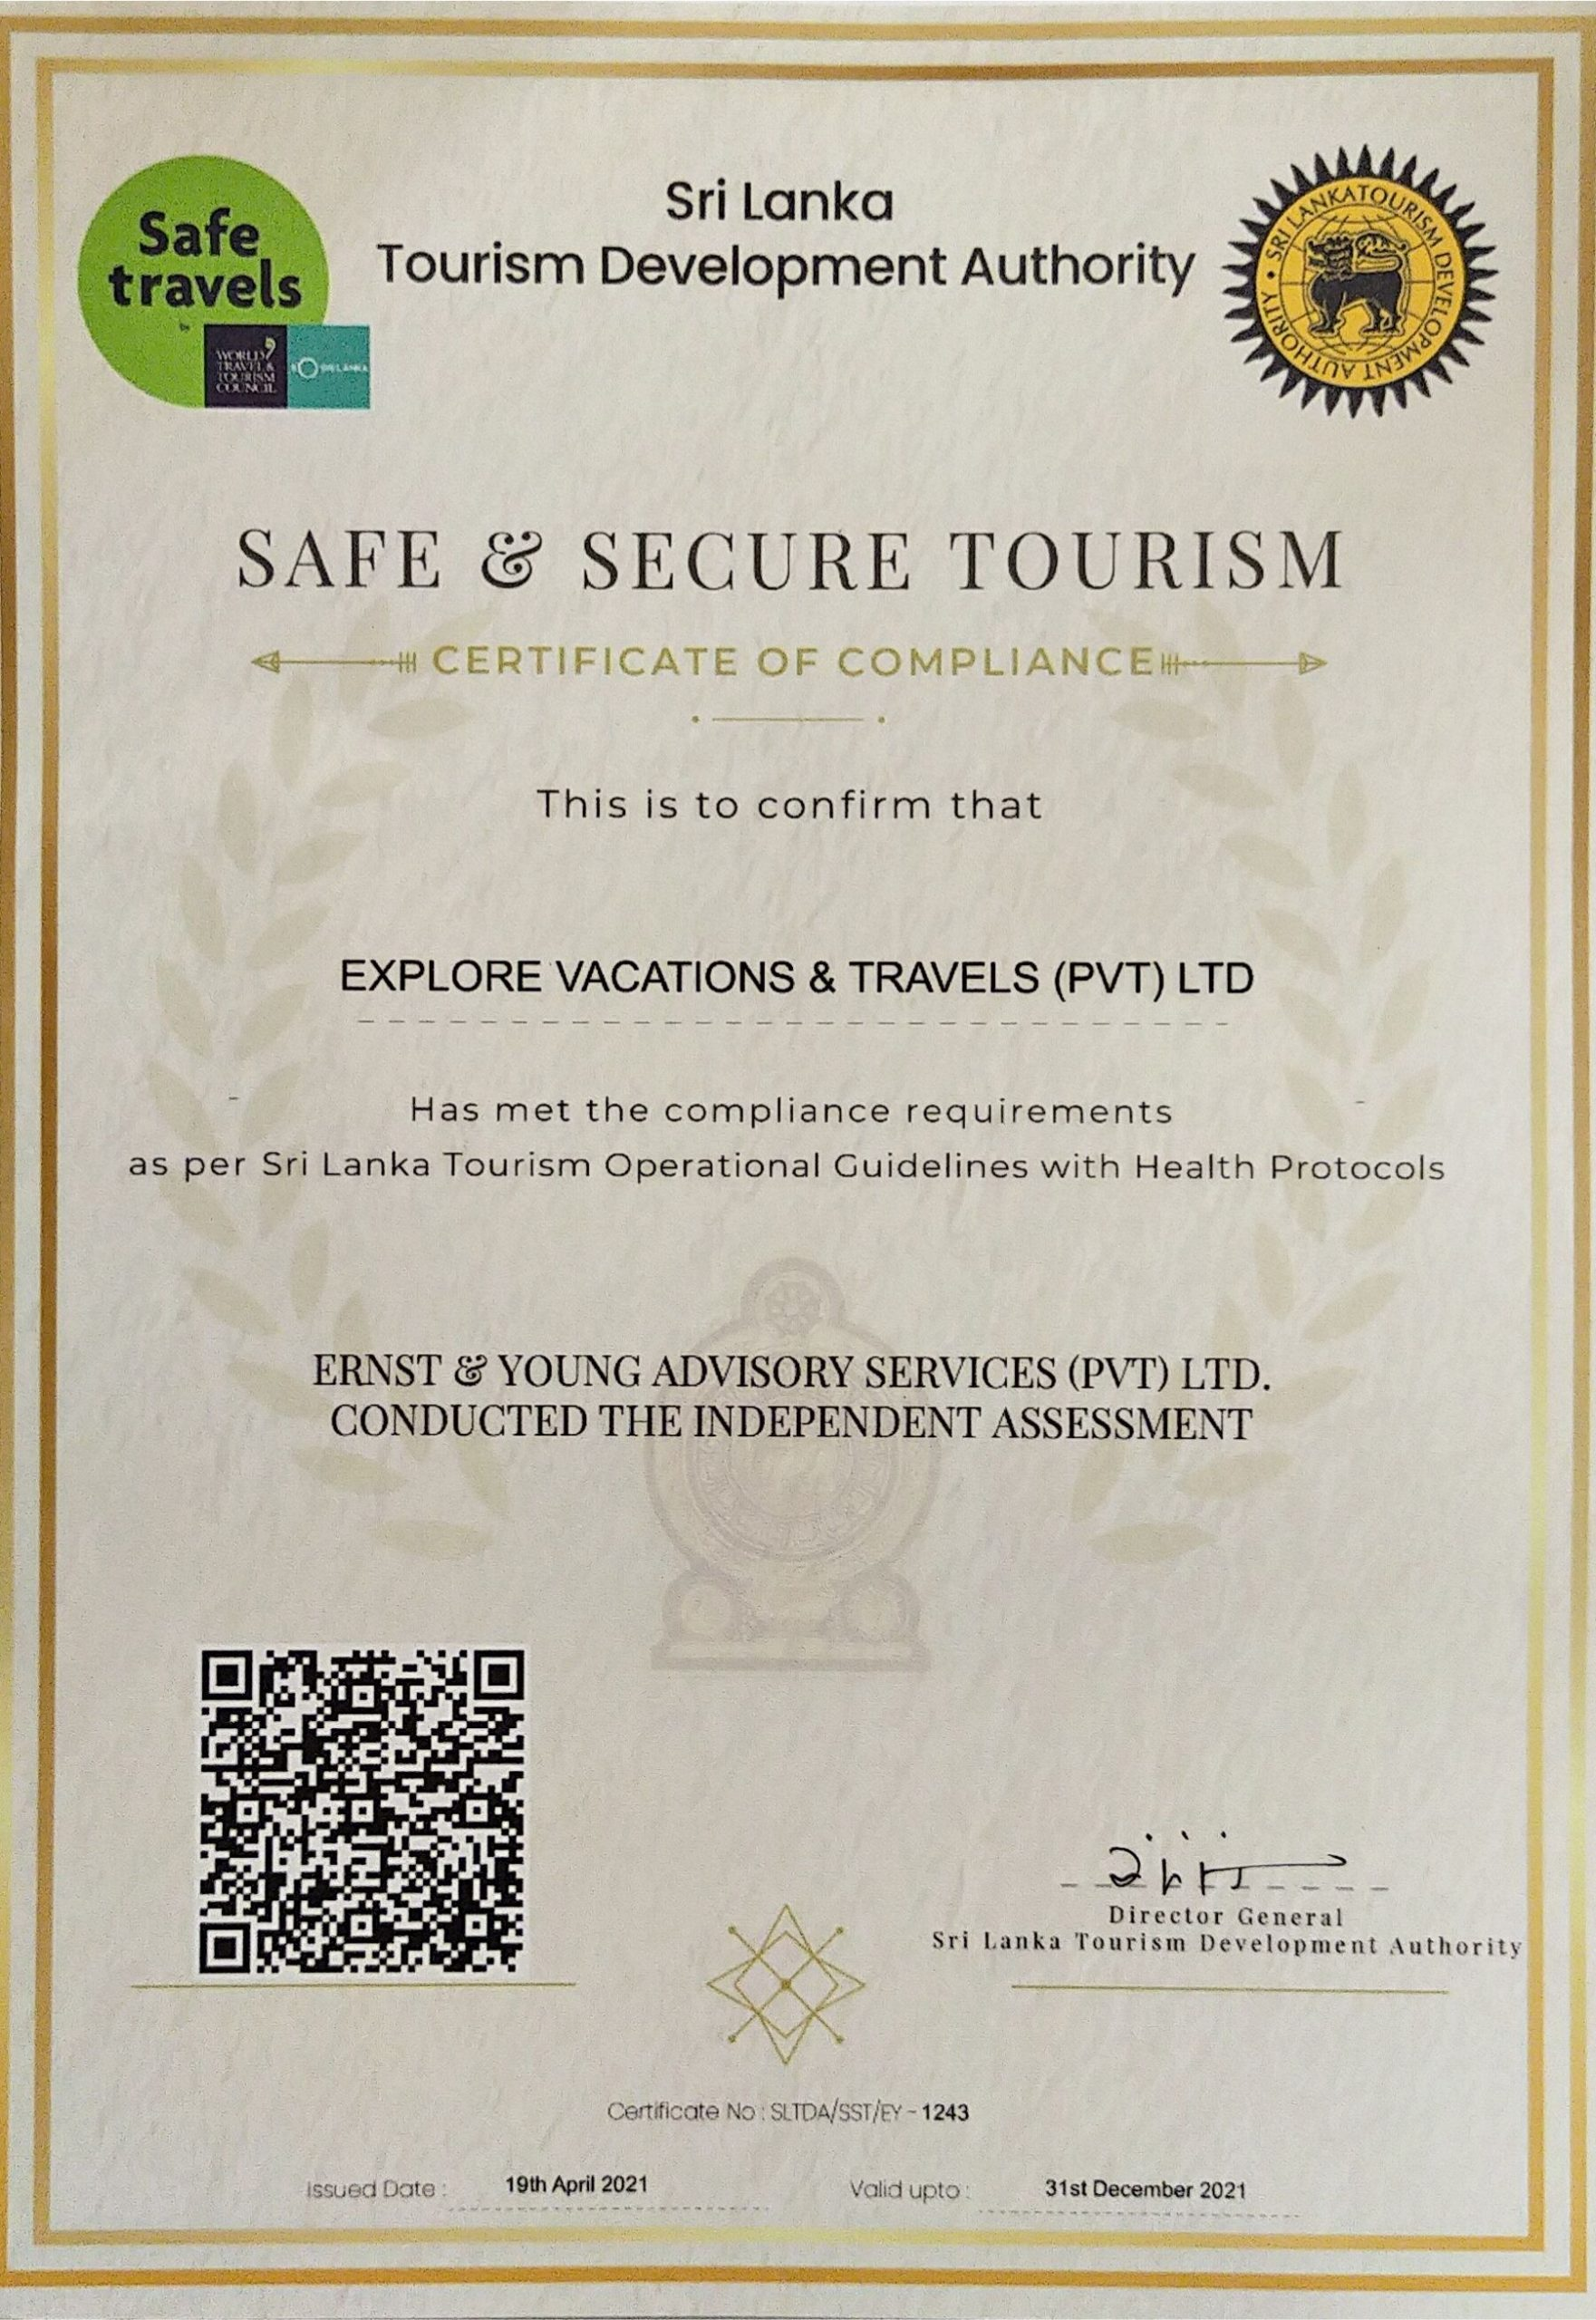 Explore Vacations & Travels (Pvt) Ltd Safe & Secure Certificate